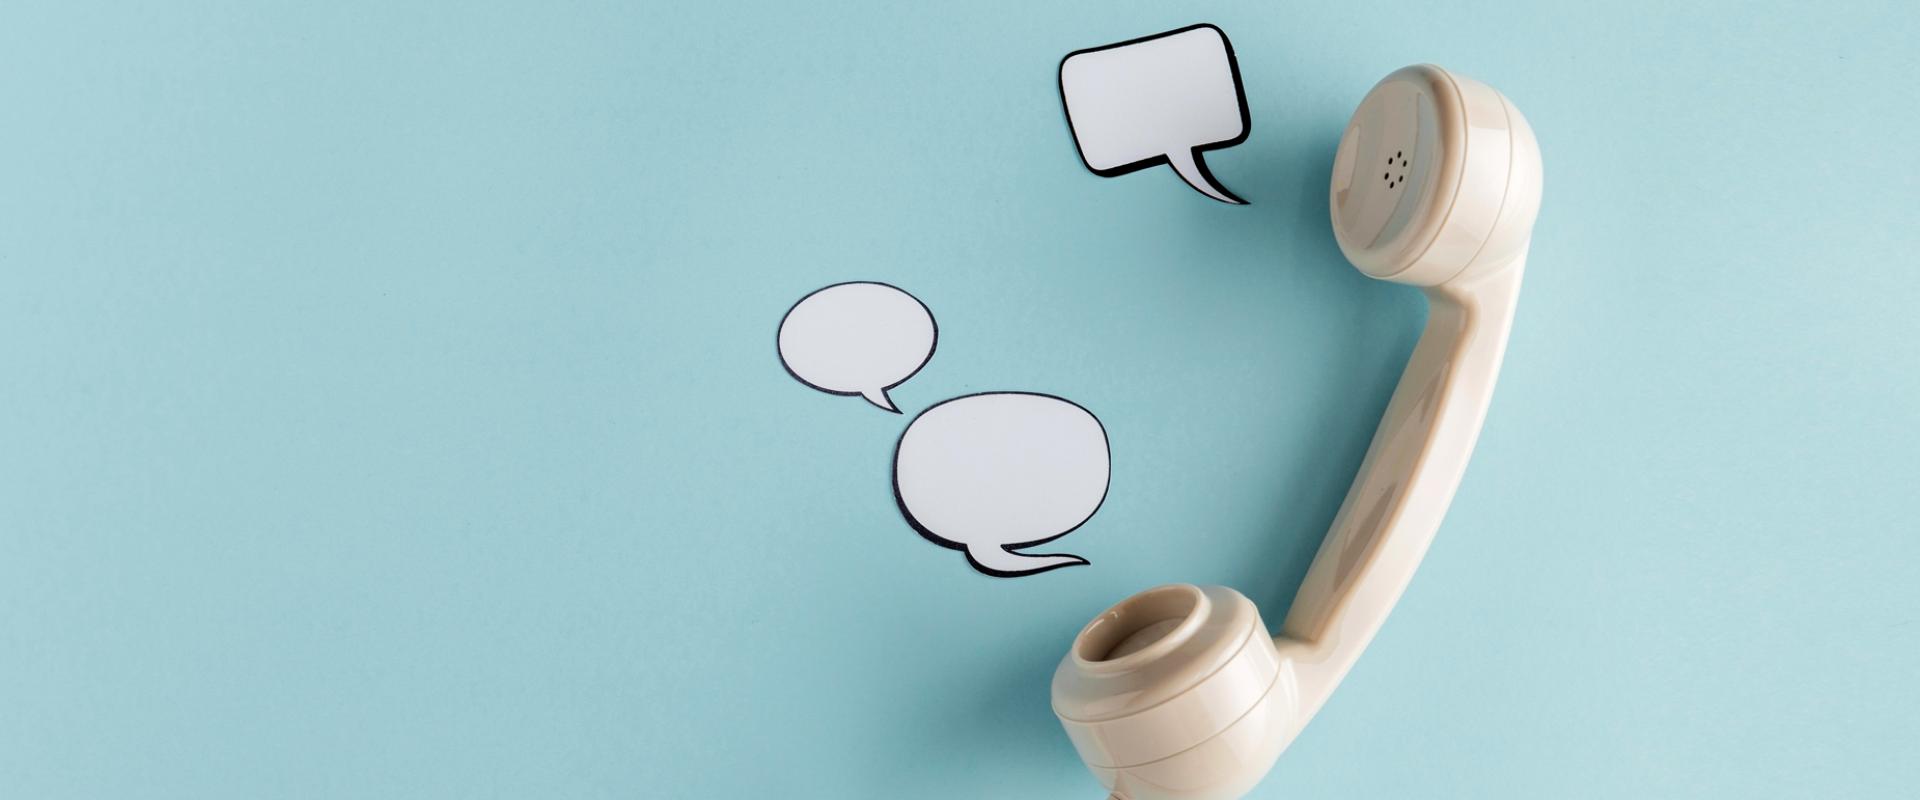 Kommunikation . Elementartraining